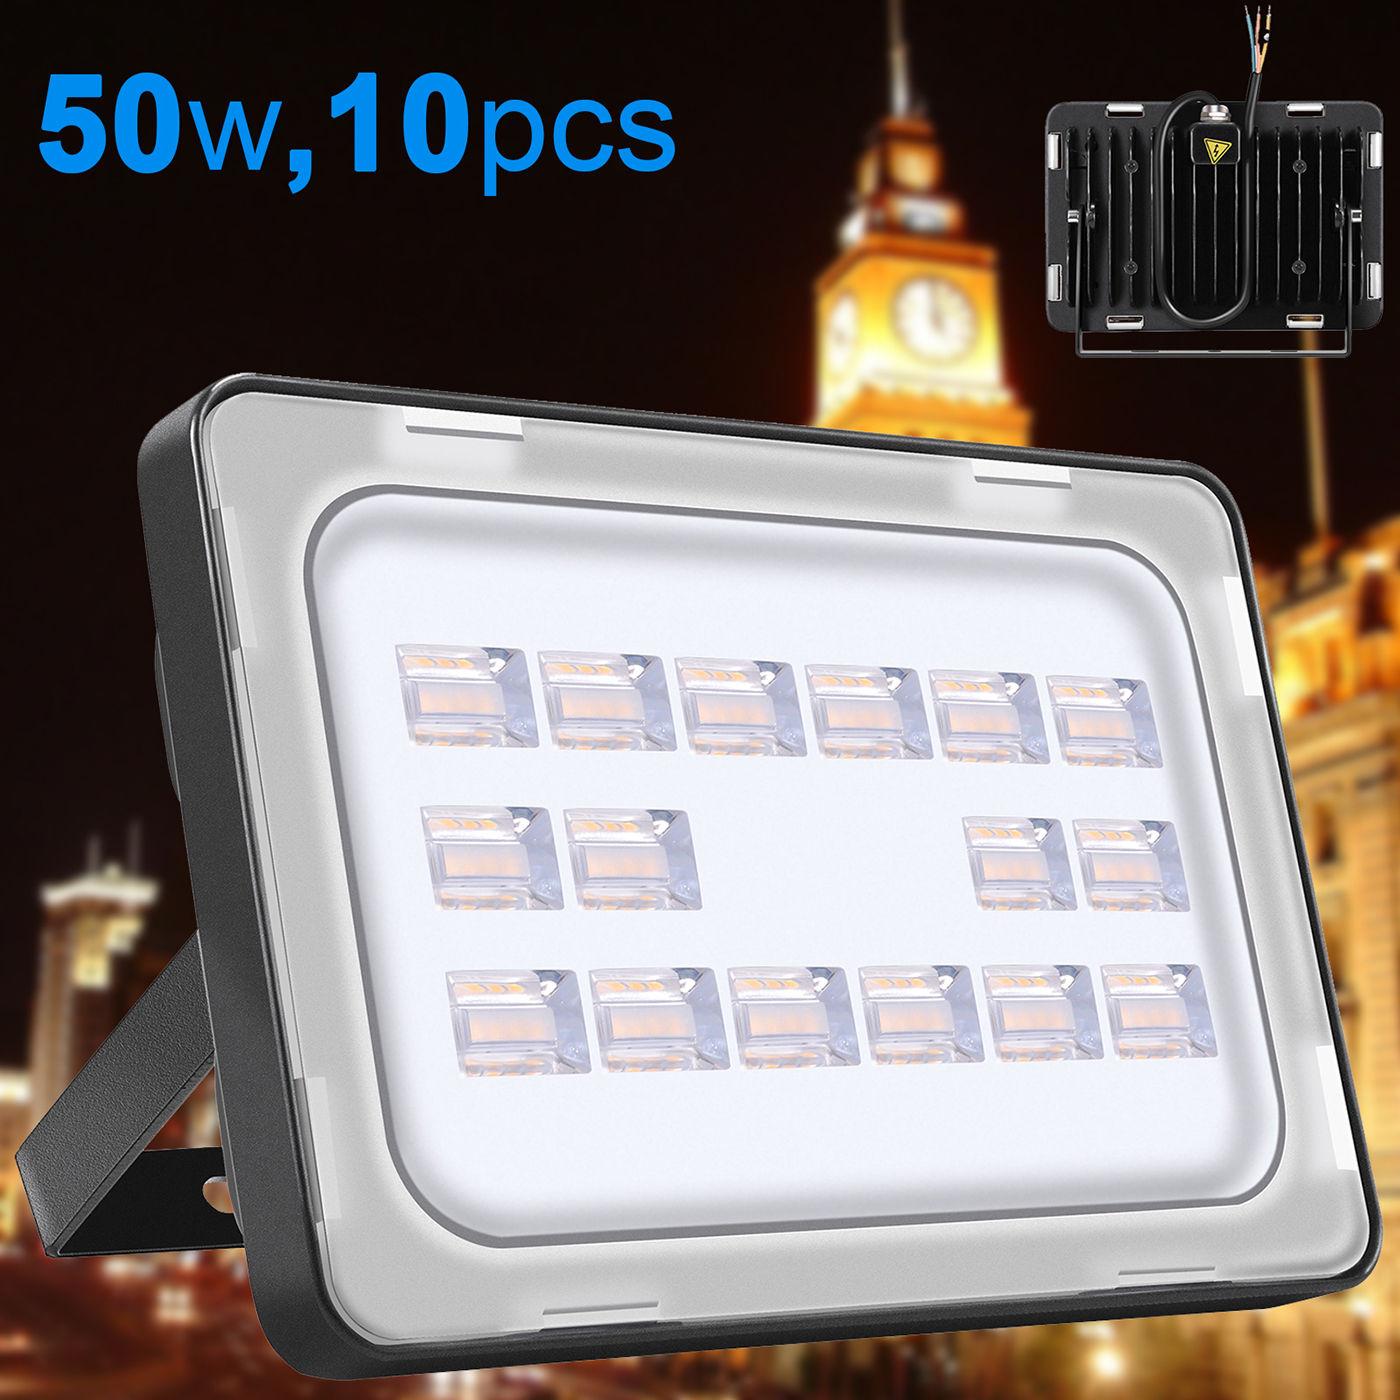 10X Viugreum 50W LED Floodlight Outdoor Garden Wall Lamp Warm White Waterproof